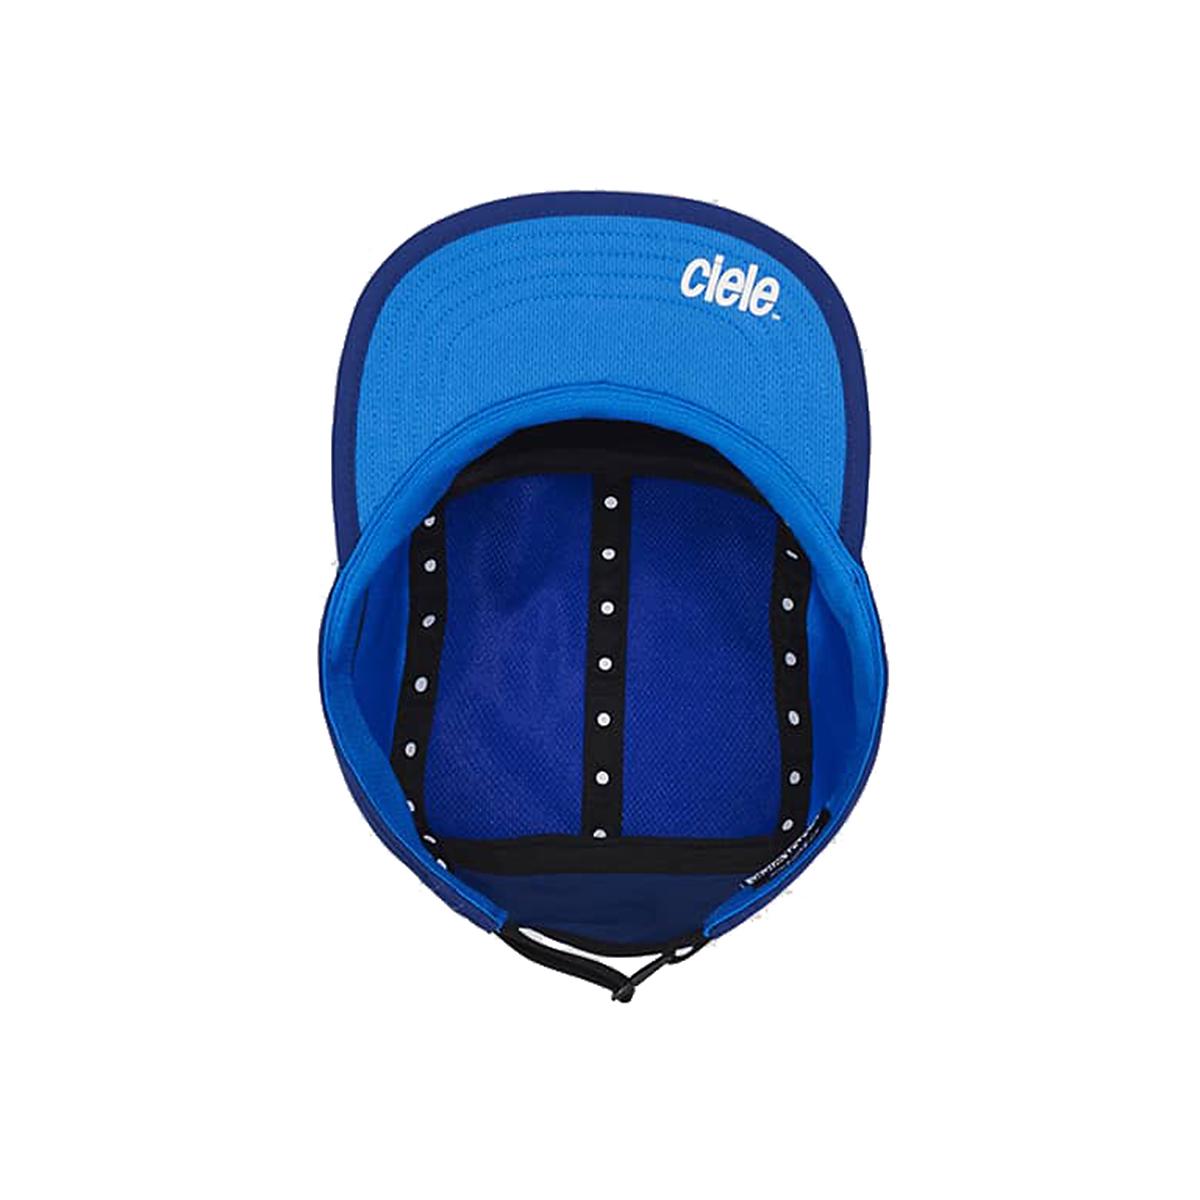 Ciele Athletics GoCap Standard Hat - Color: Indigo, Indigo, large, image 2